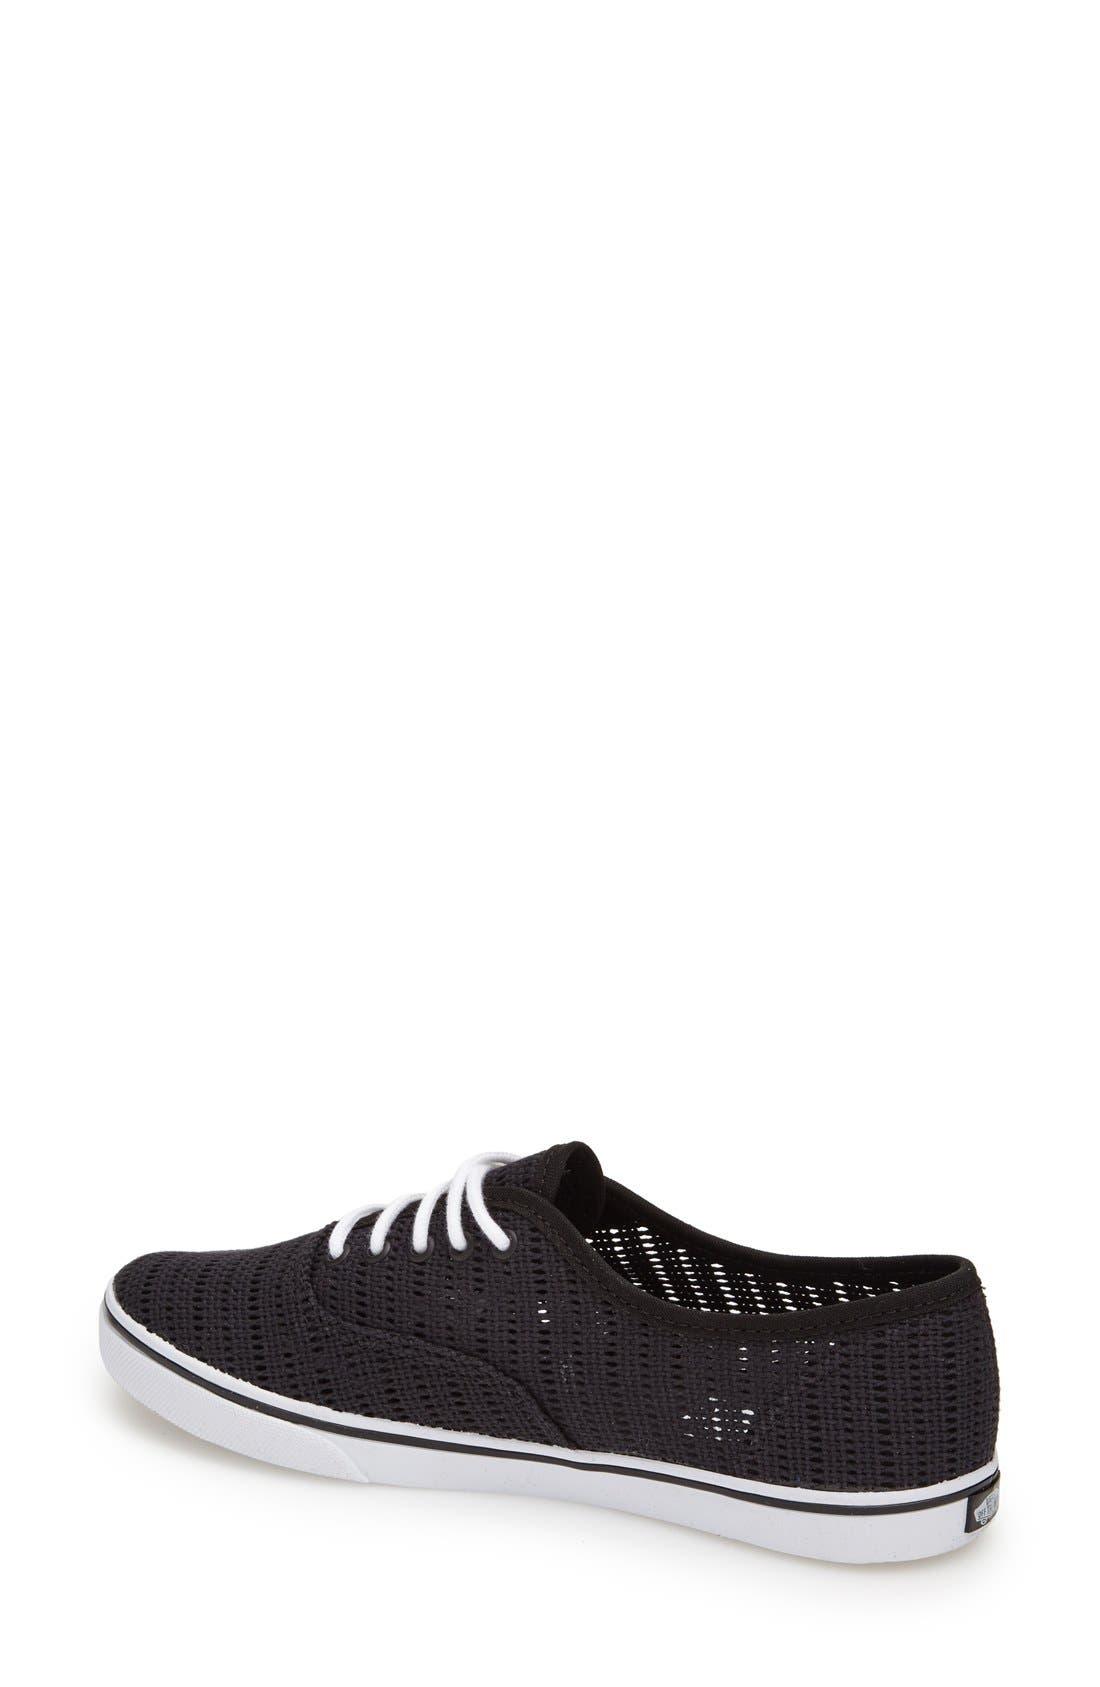 Alternate Image 2  - Vans 'Lo Pro' Sneaker (Women)